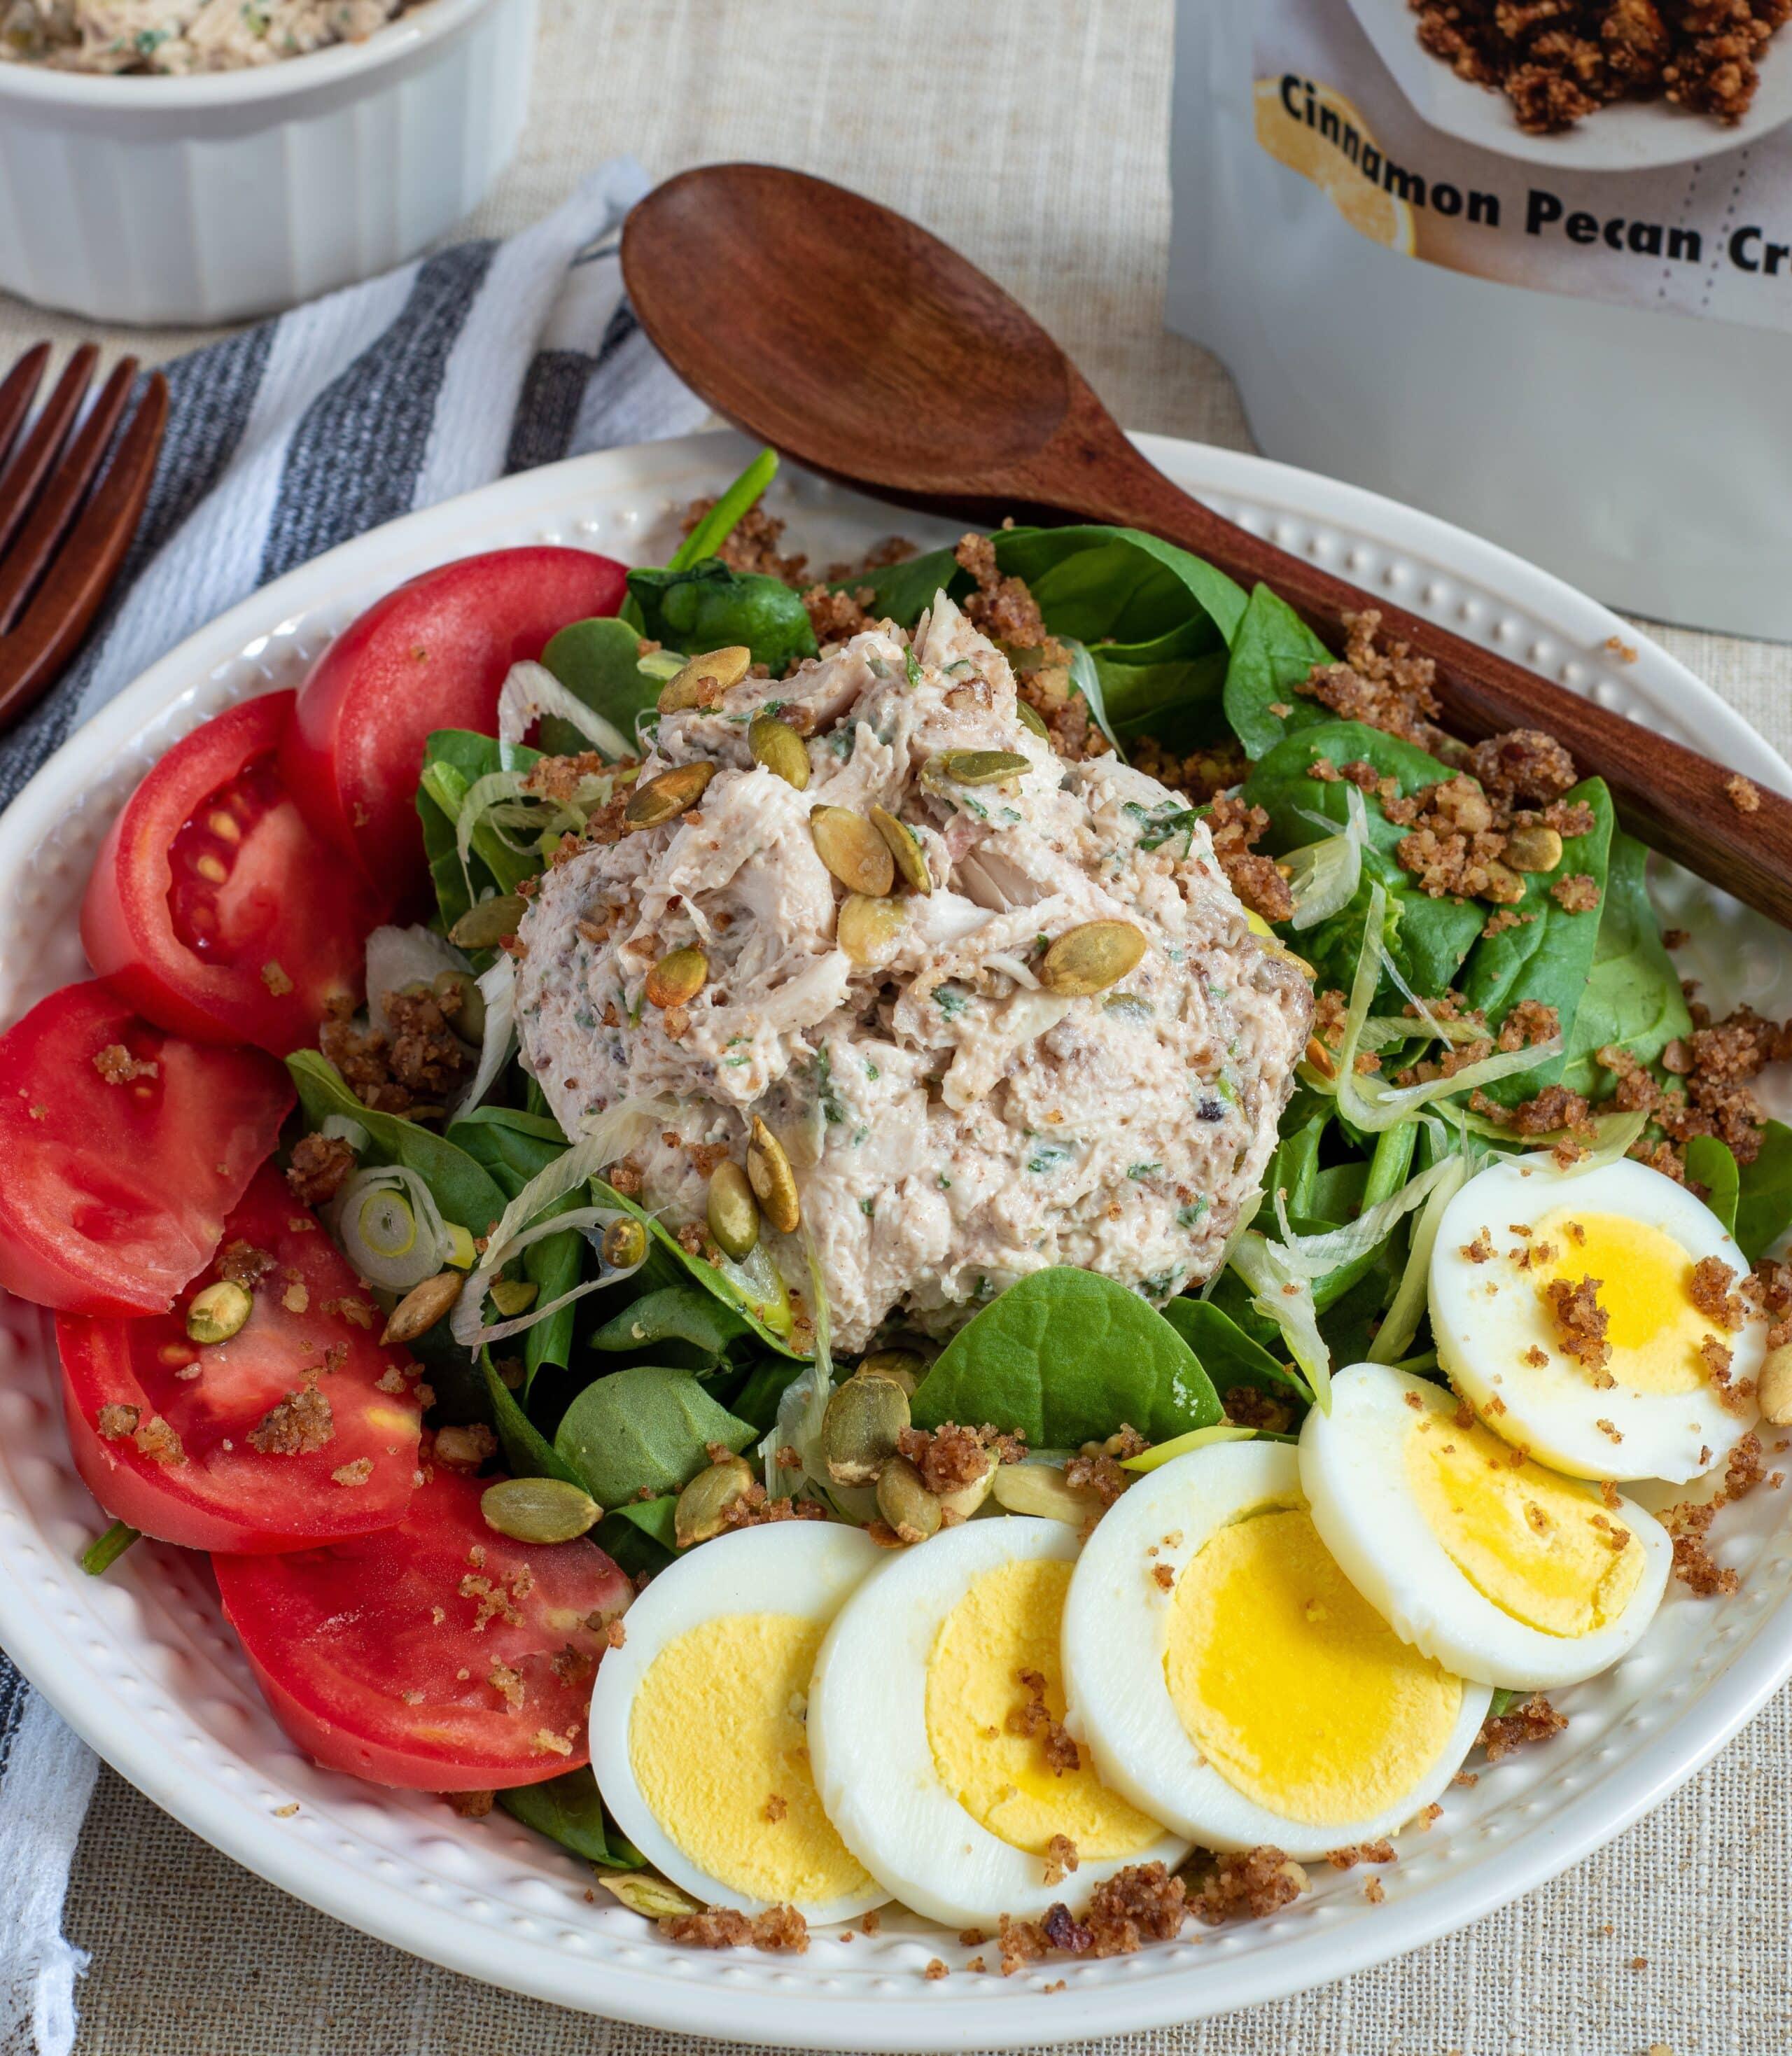 Lollis Cinnamon Pecan Fall harvest chicken salad